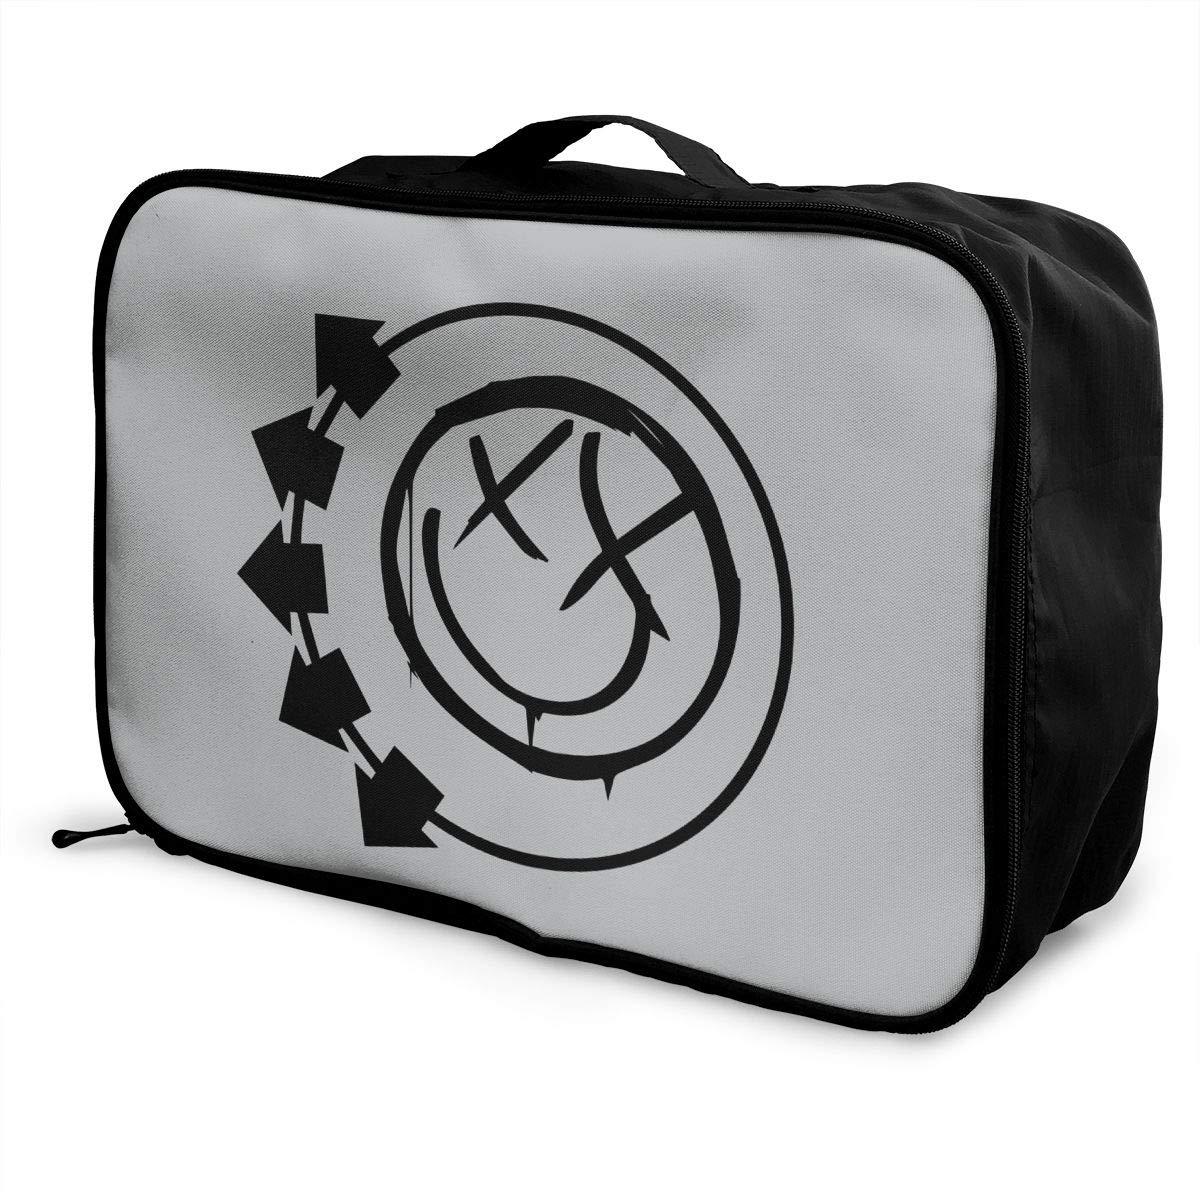 Blink-182 Logo Travel Luggage Storage Bag Duffel Bag Handle Makeup Bag Fashion Lightweight Large Capacity Portable Luggage Bag